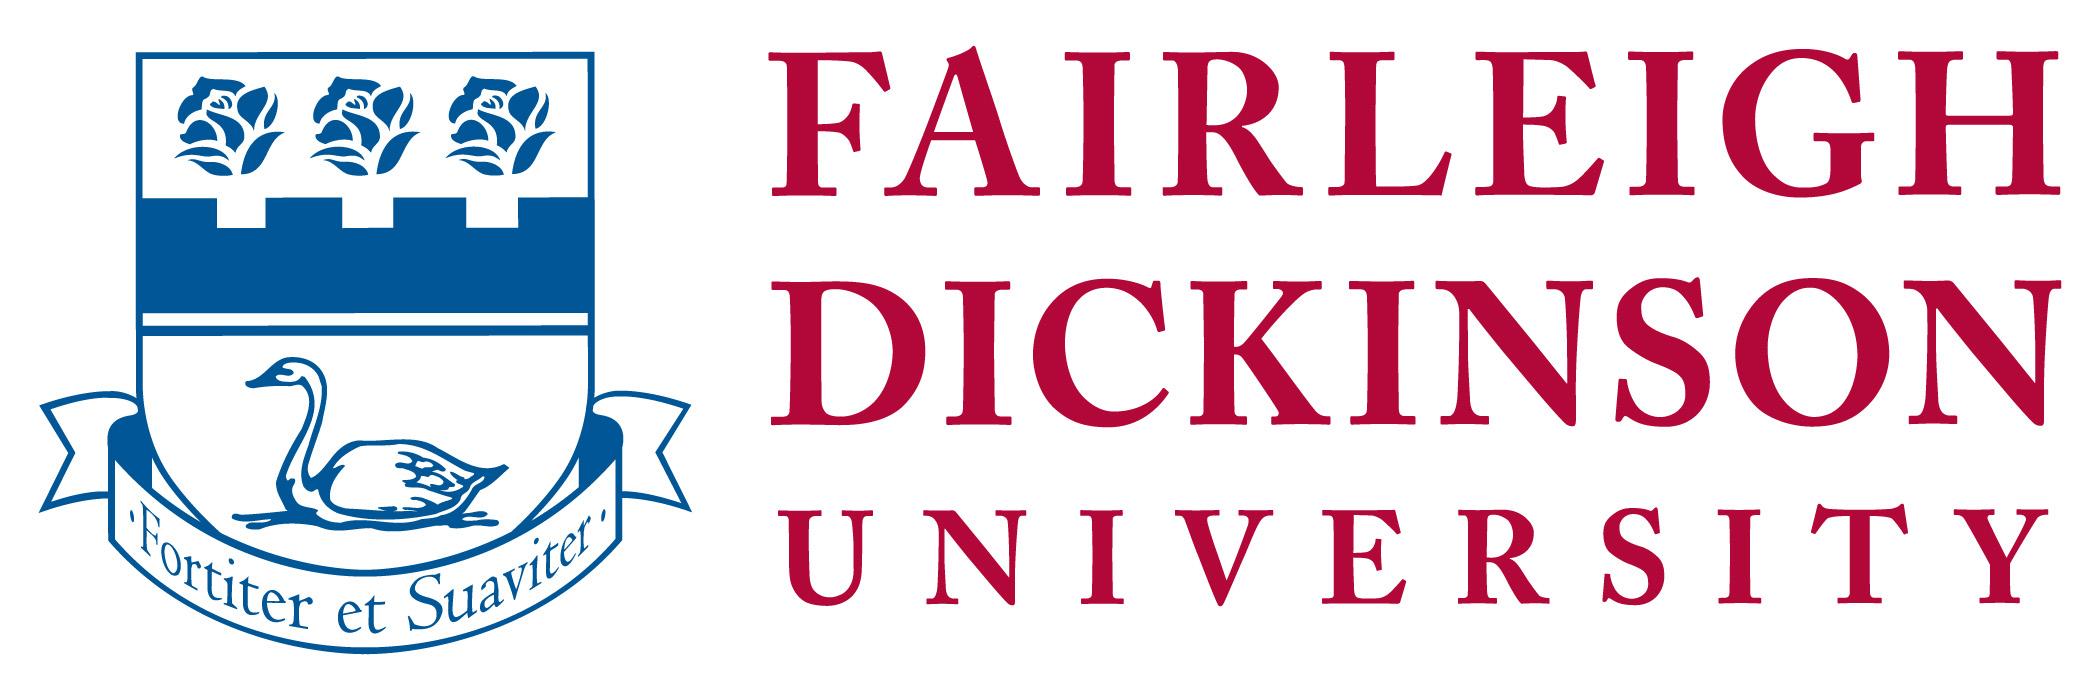 Image result for Fairleigh Dickinson University logo